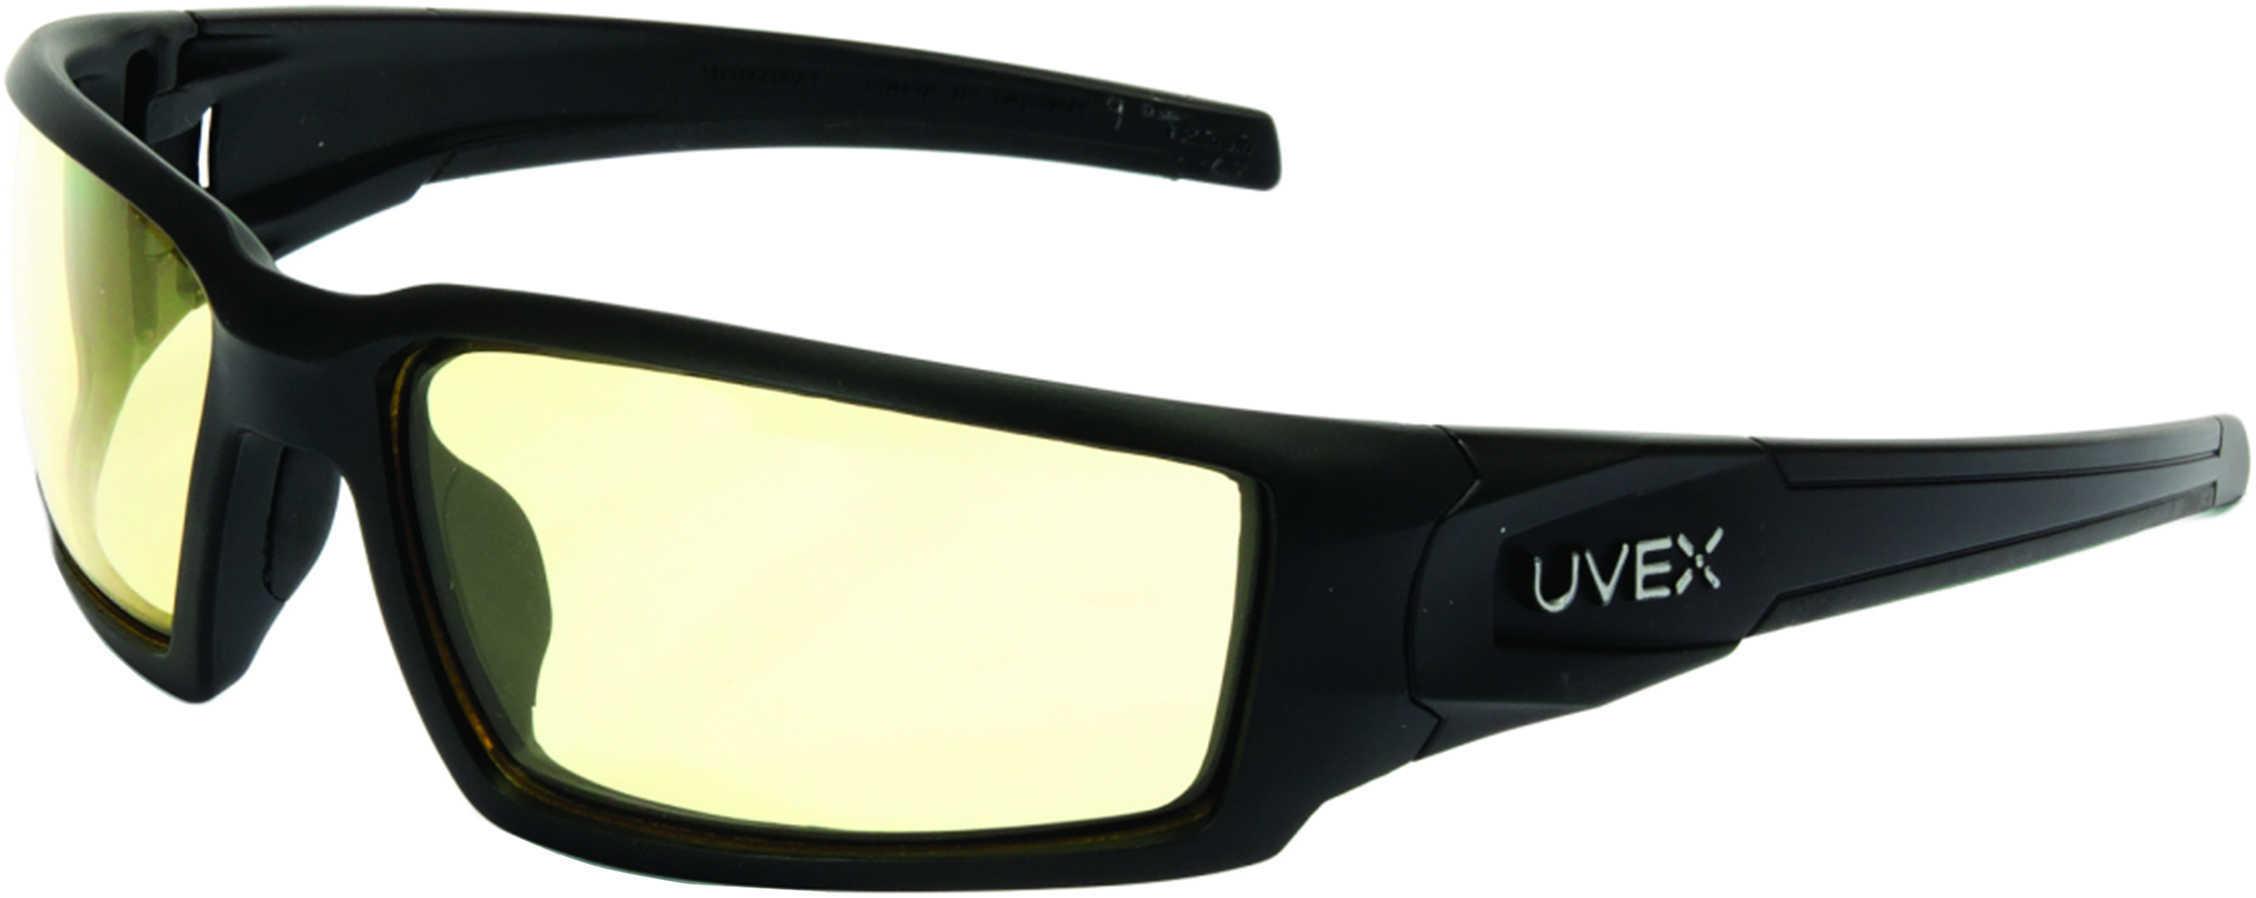 Howard Leight Hypershock Safety Eyewear w/Uvextreme Plus Anti-Fog Lens Amber Lens Md: R-02221